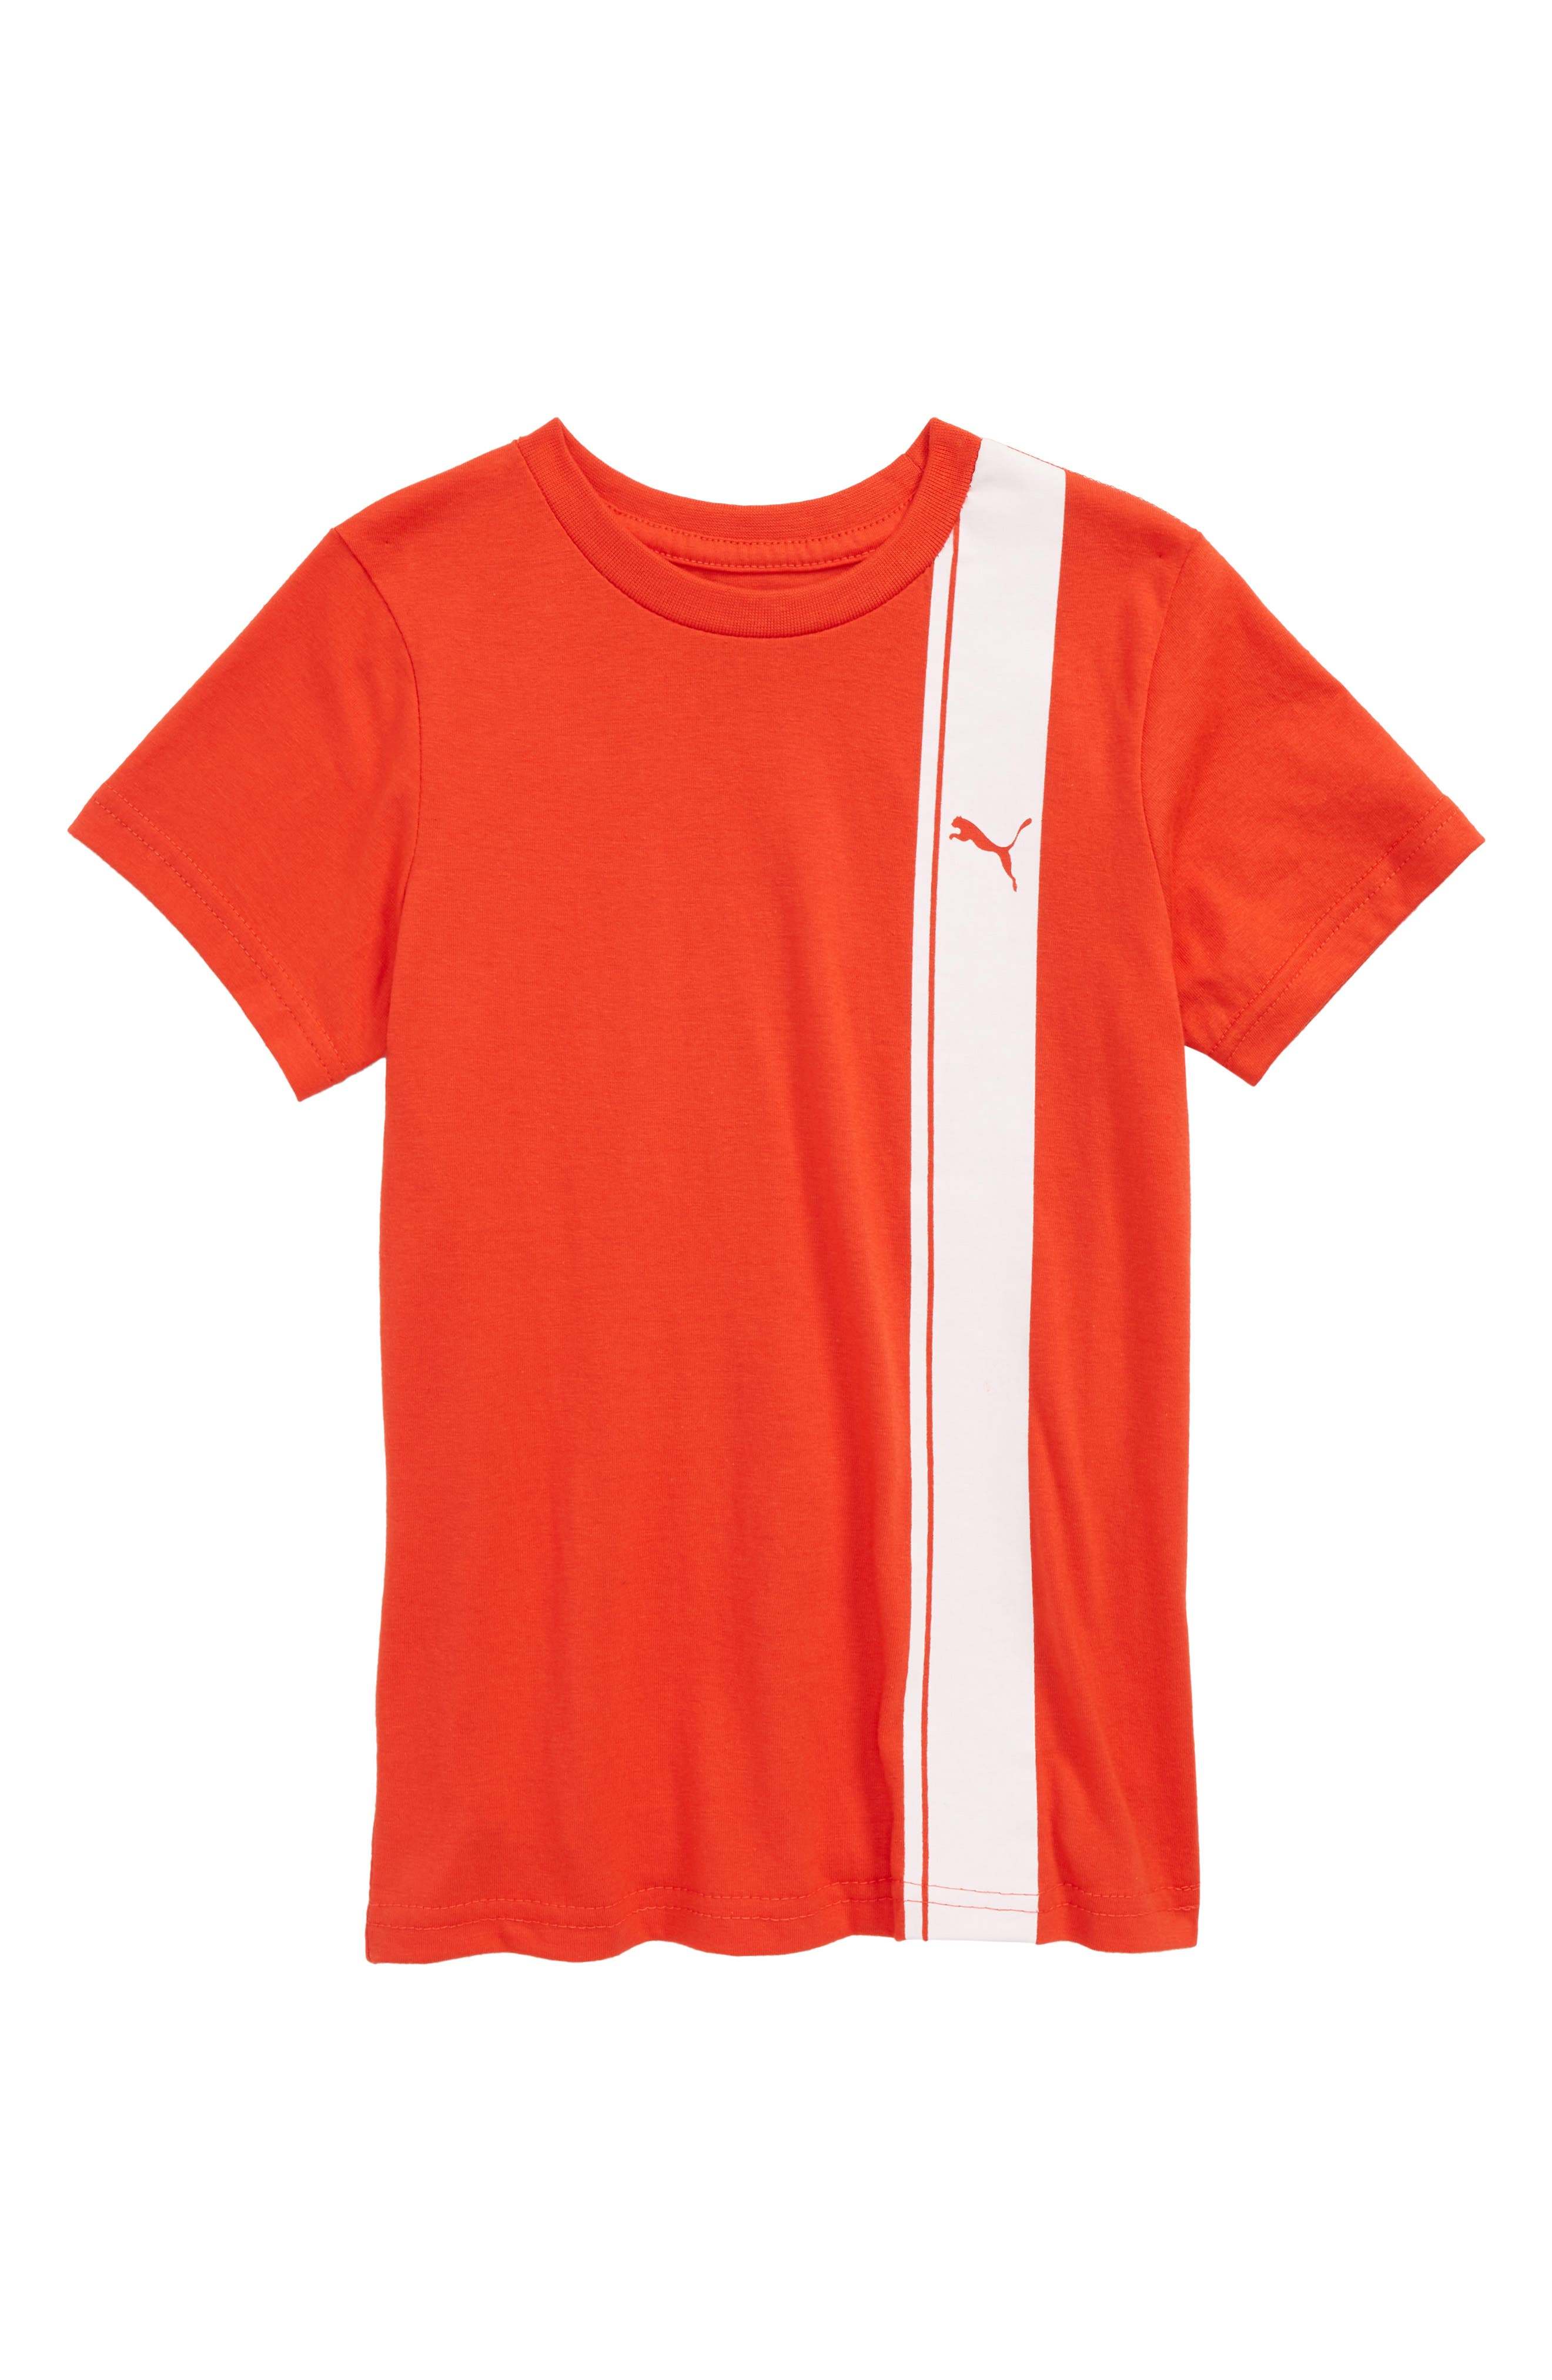 PUMA Logo T-Shirt (Little Boys)